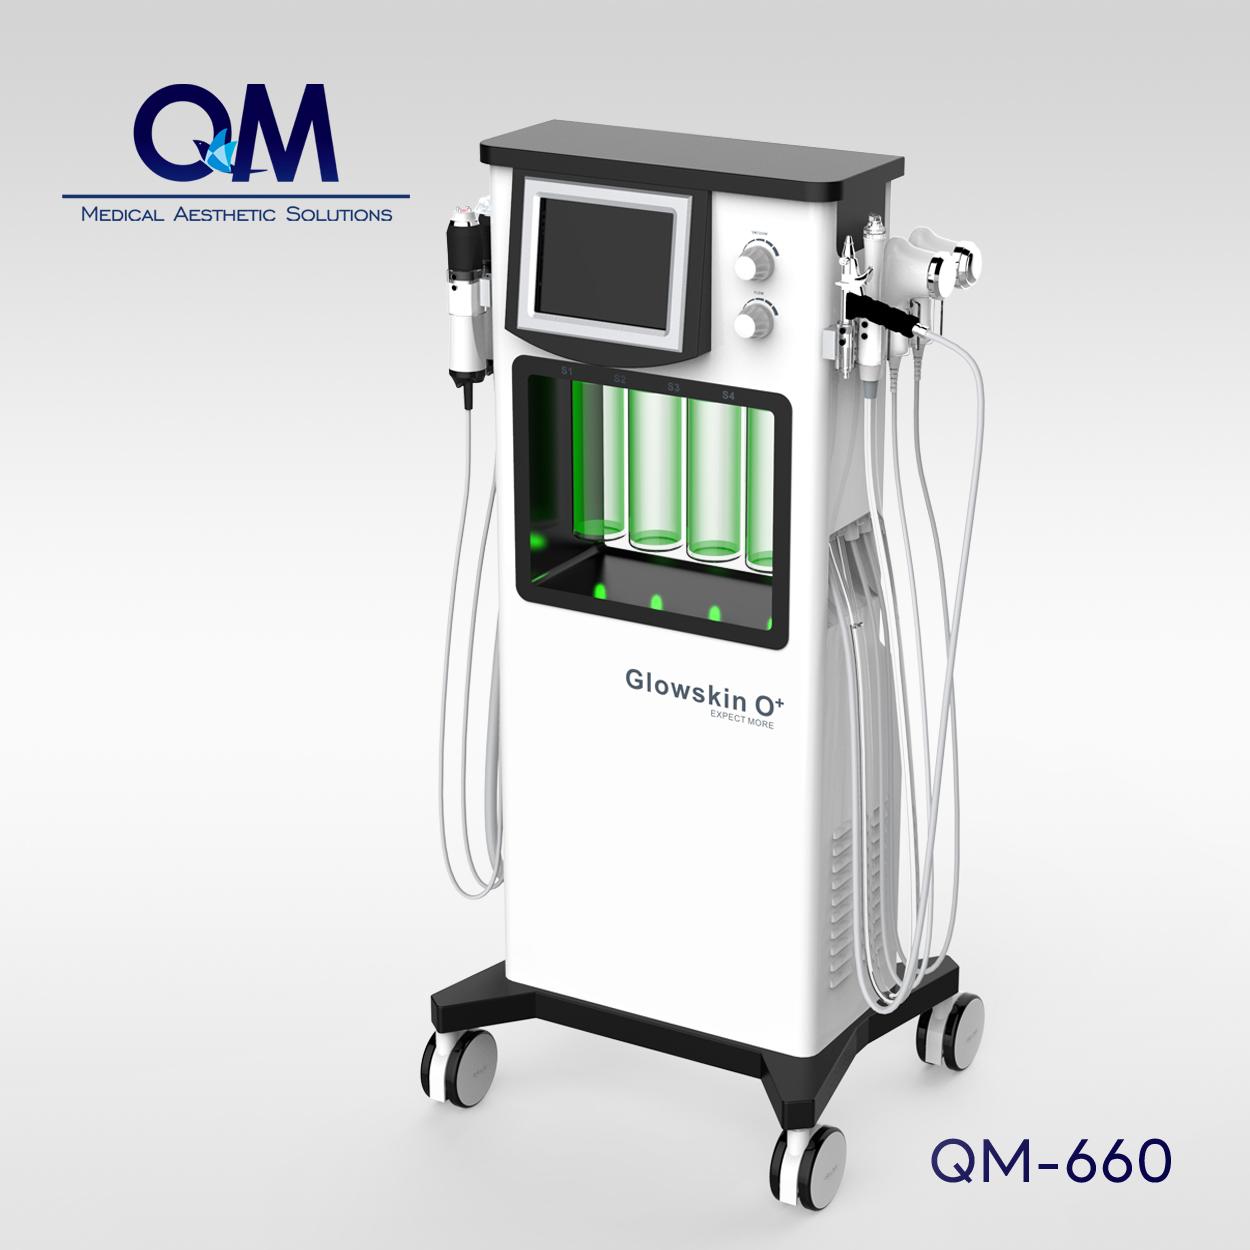 QM-660